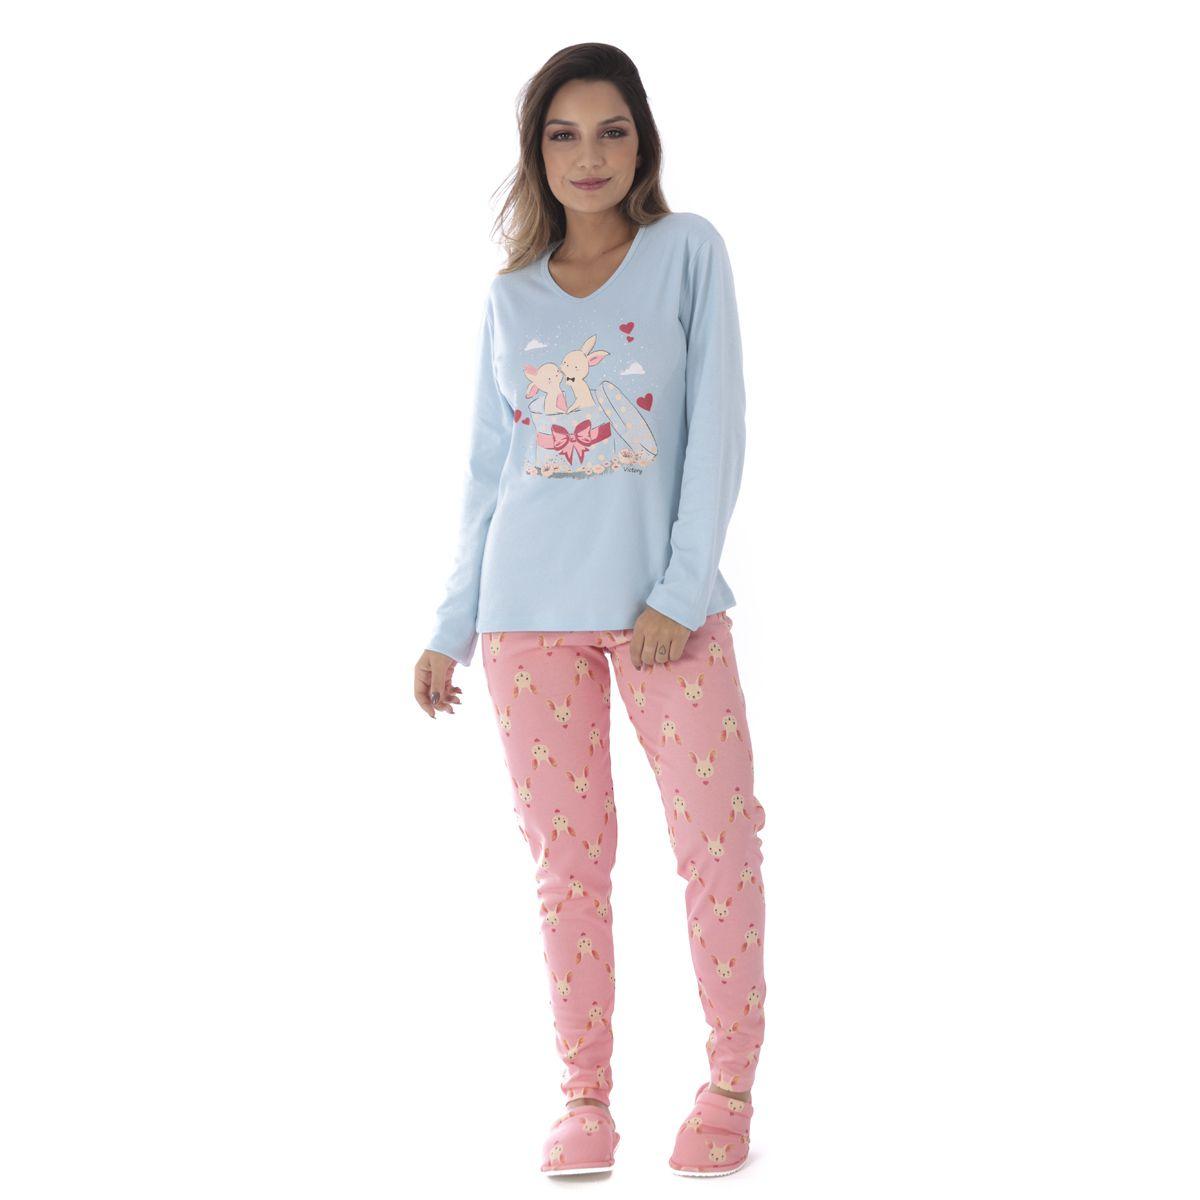 Pijama de inverno feminino SWEET Victory